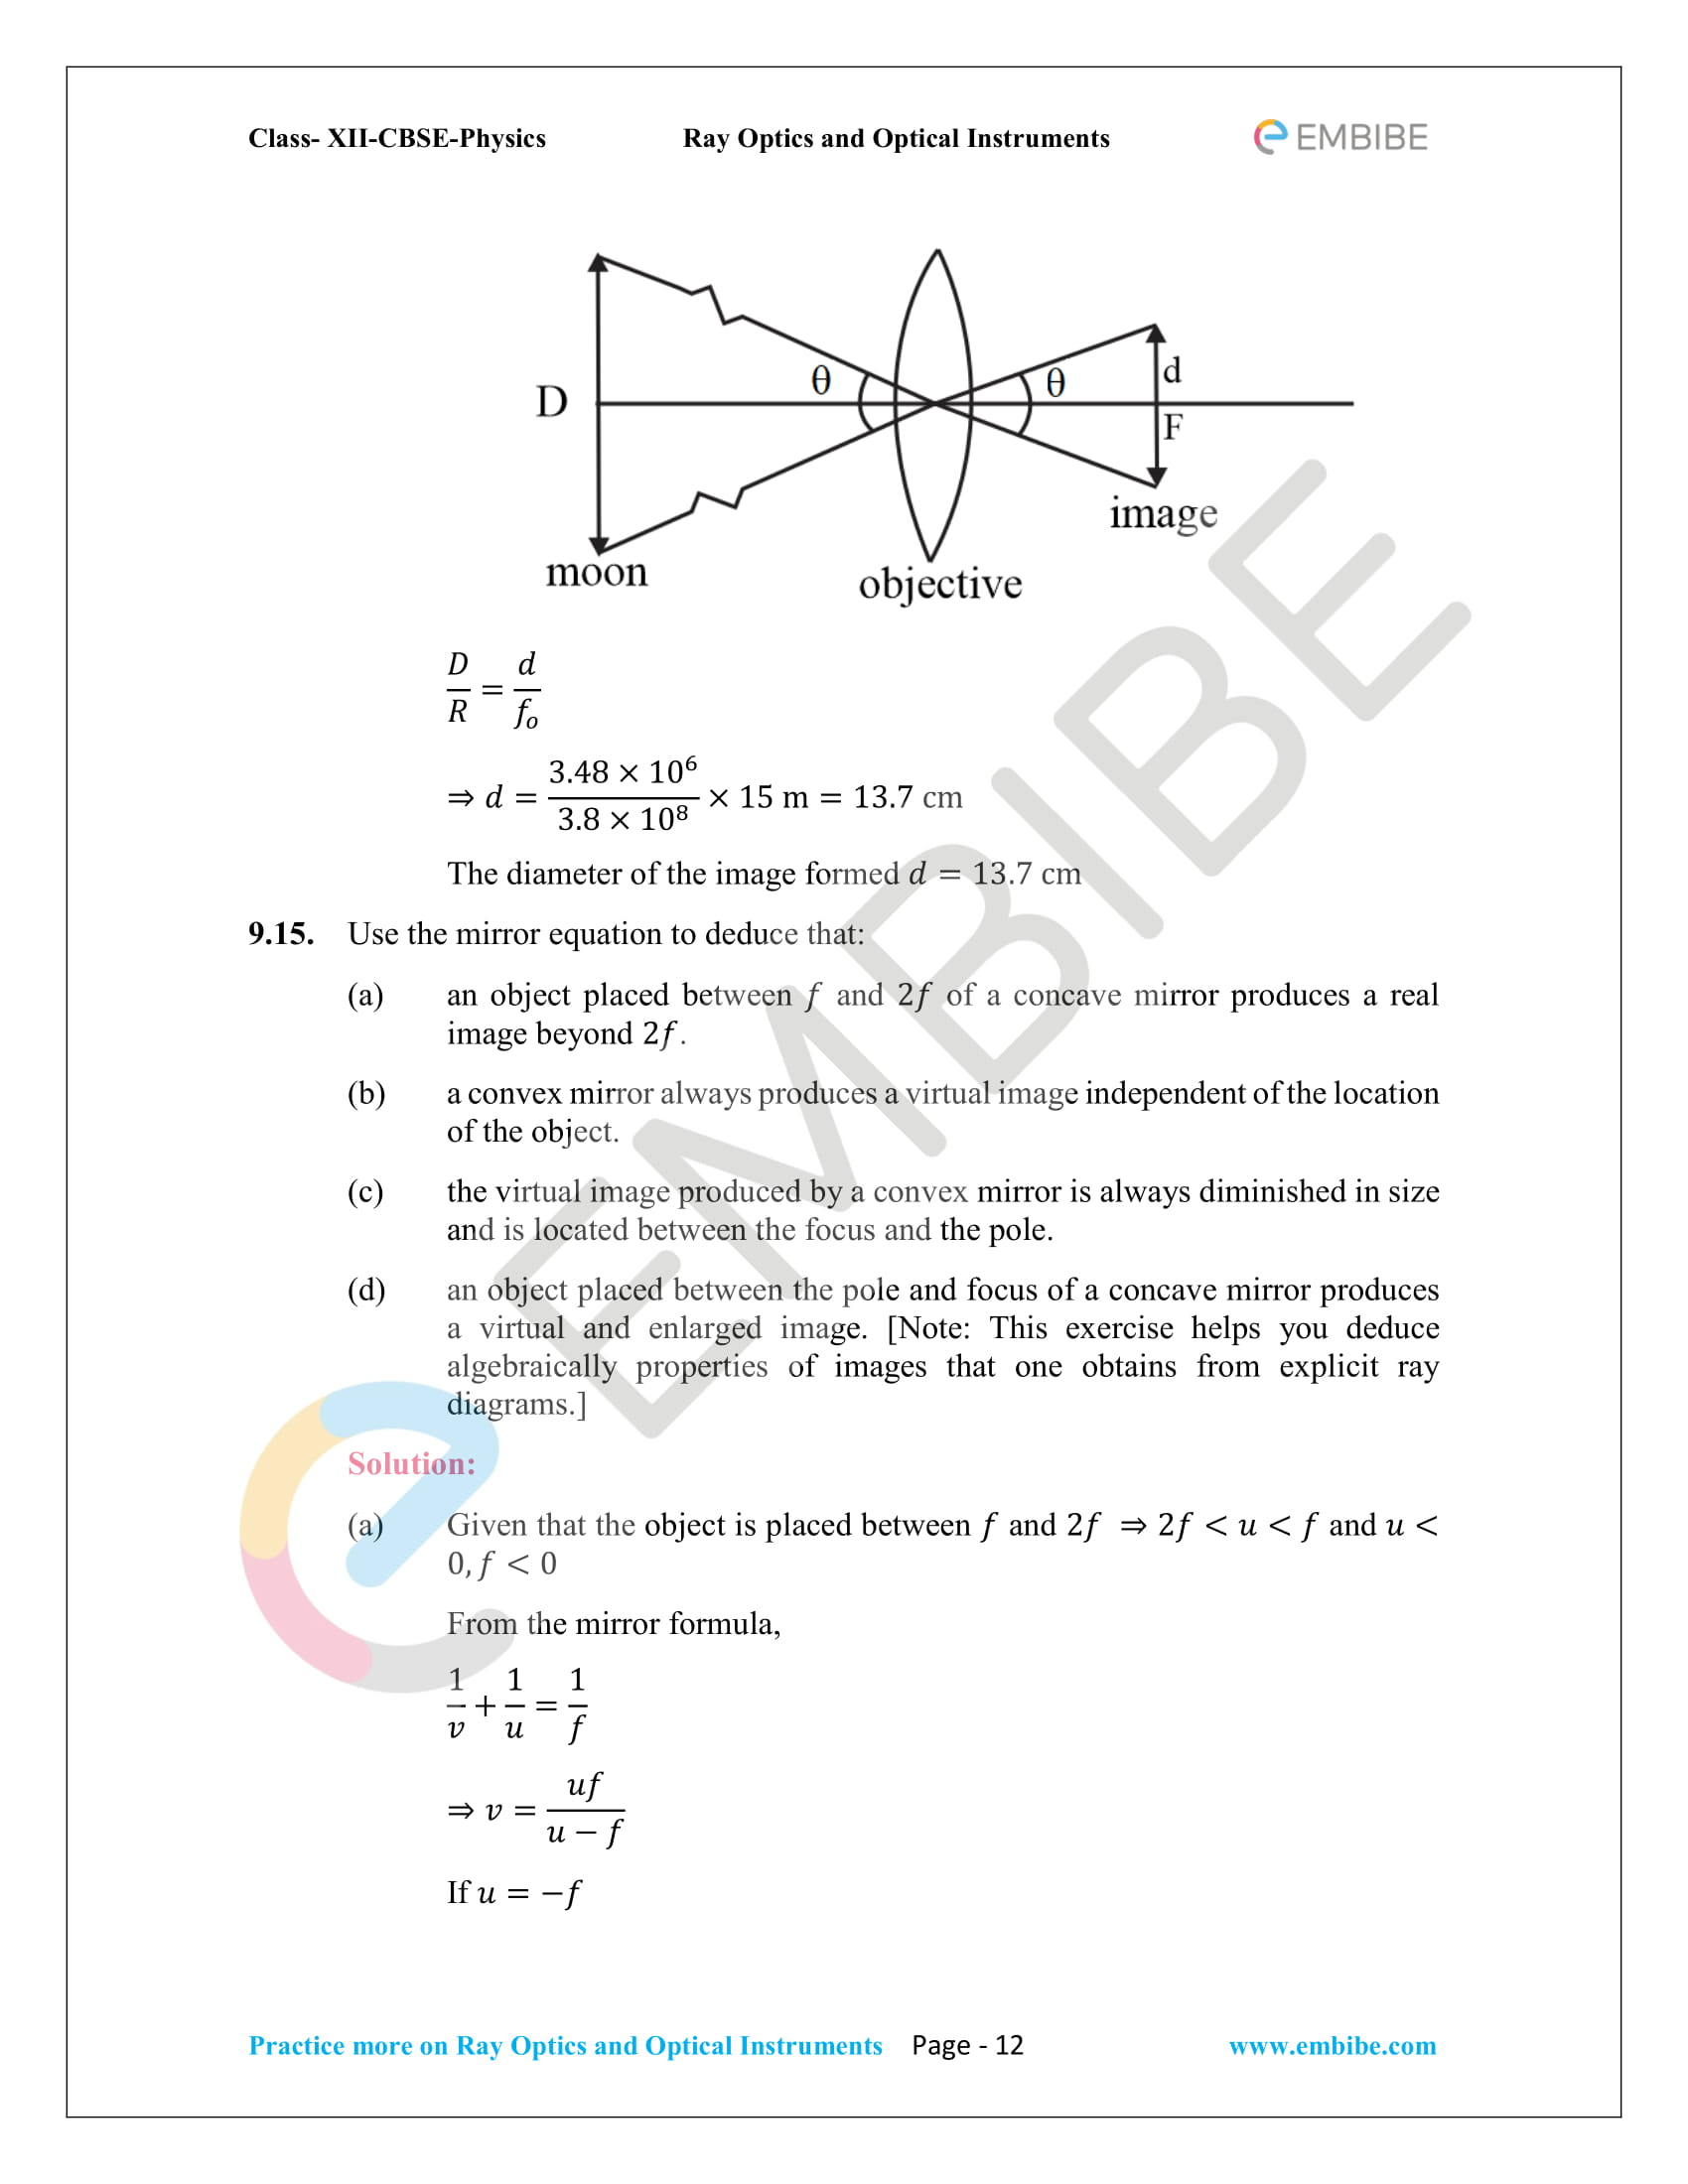 NCERT_Grade 12_Physics_Ch_09_Ray Optics-12